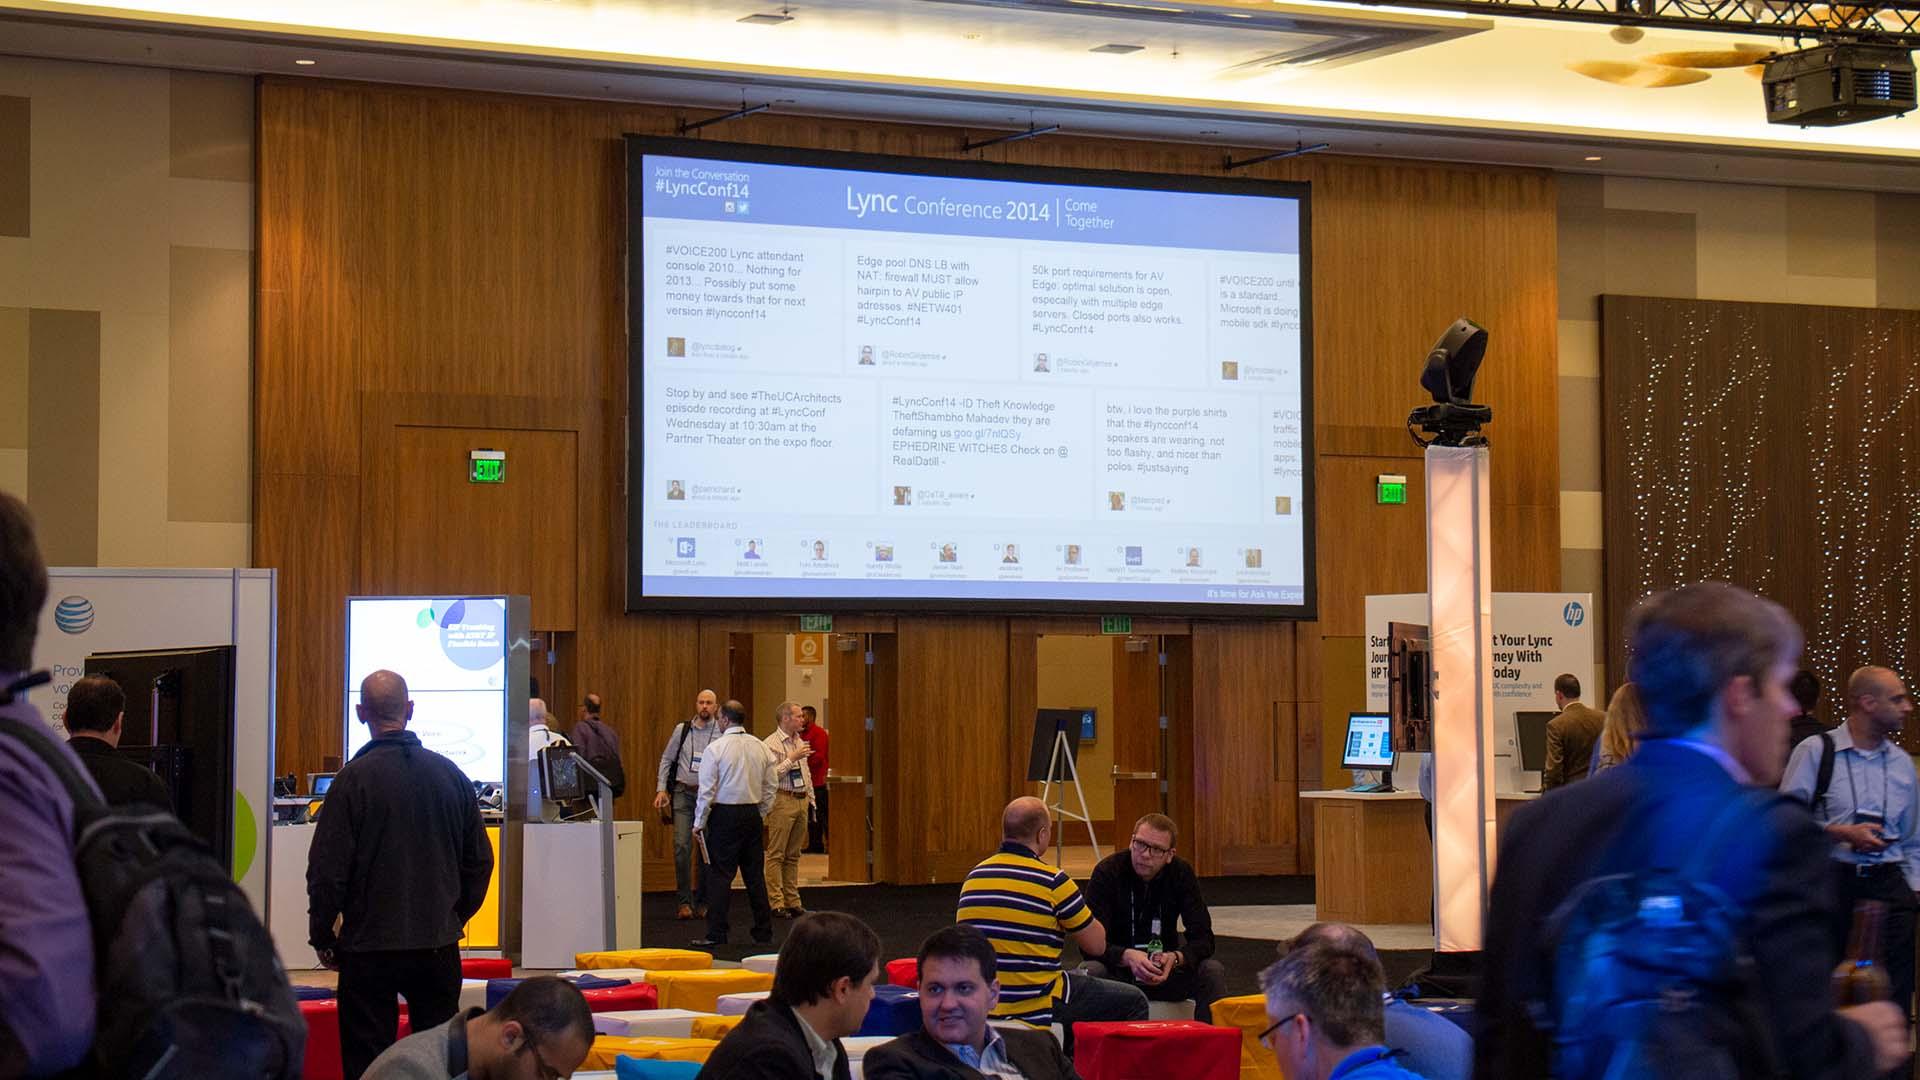 Microsoft Lync Conference Main Entrance